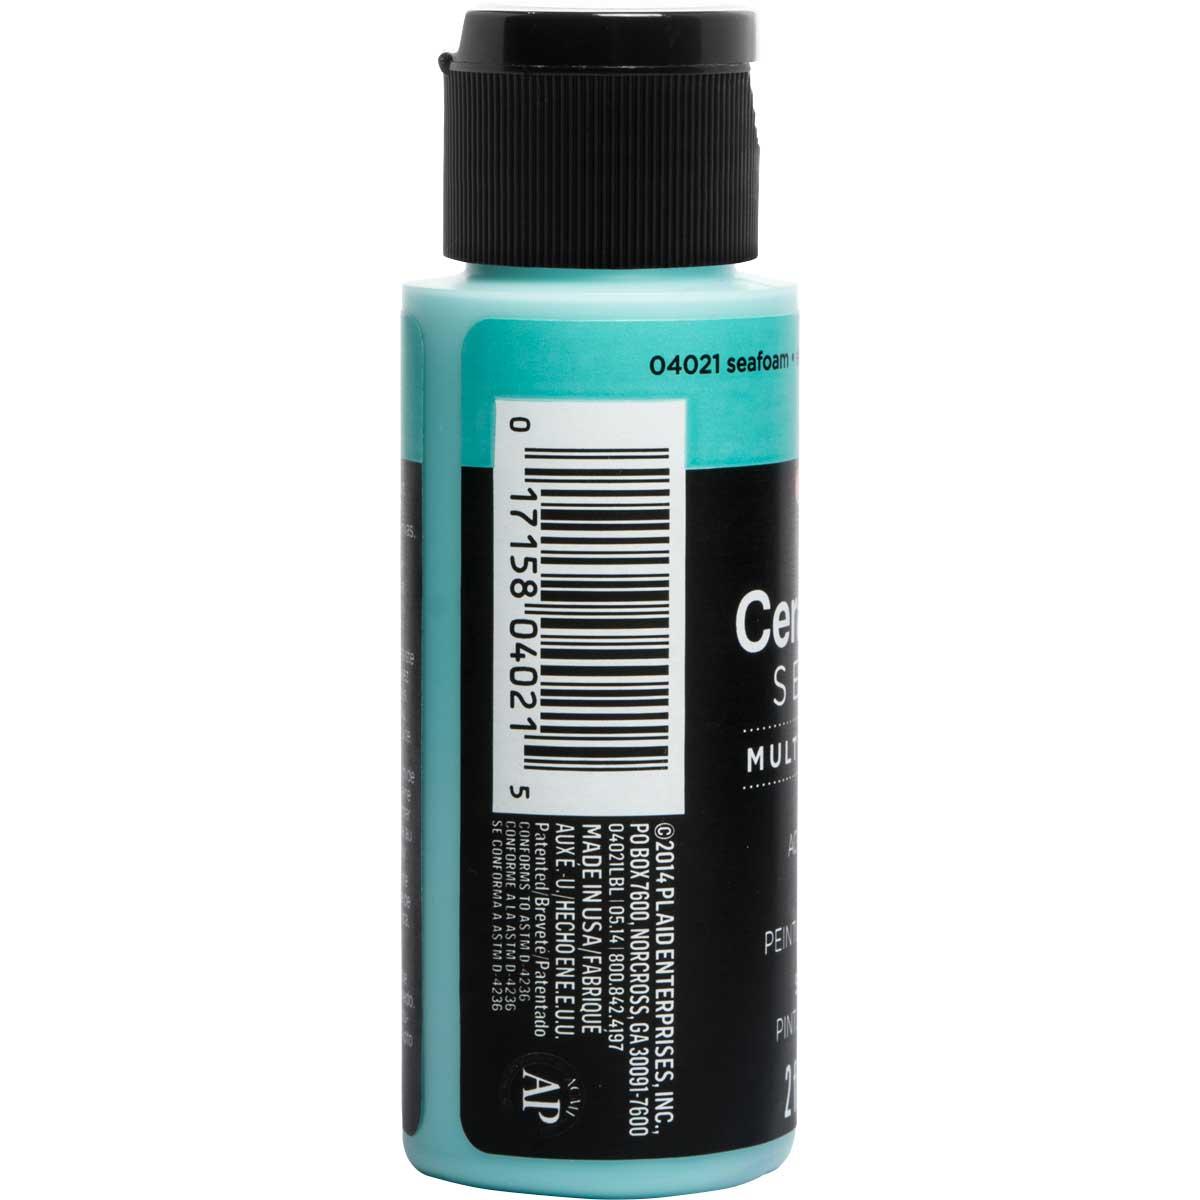 Delta Ceramcoat ® Select Multi-Surface Acrylic Paint - Satin - Seafoam, 2 oz.